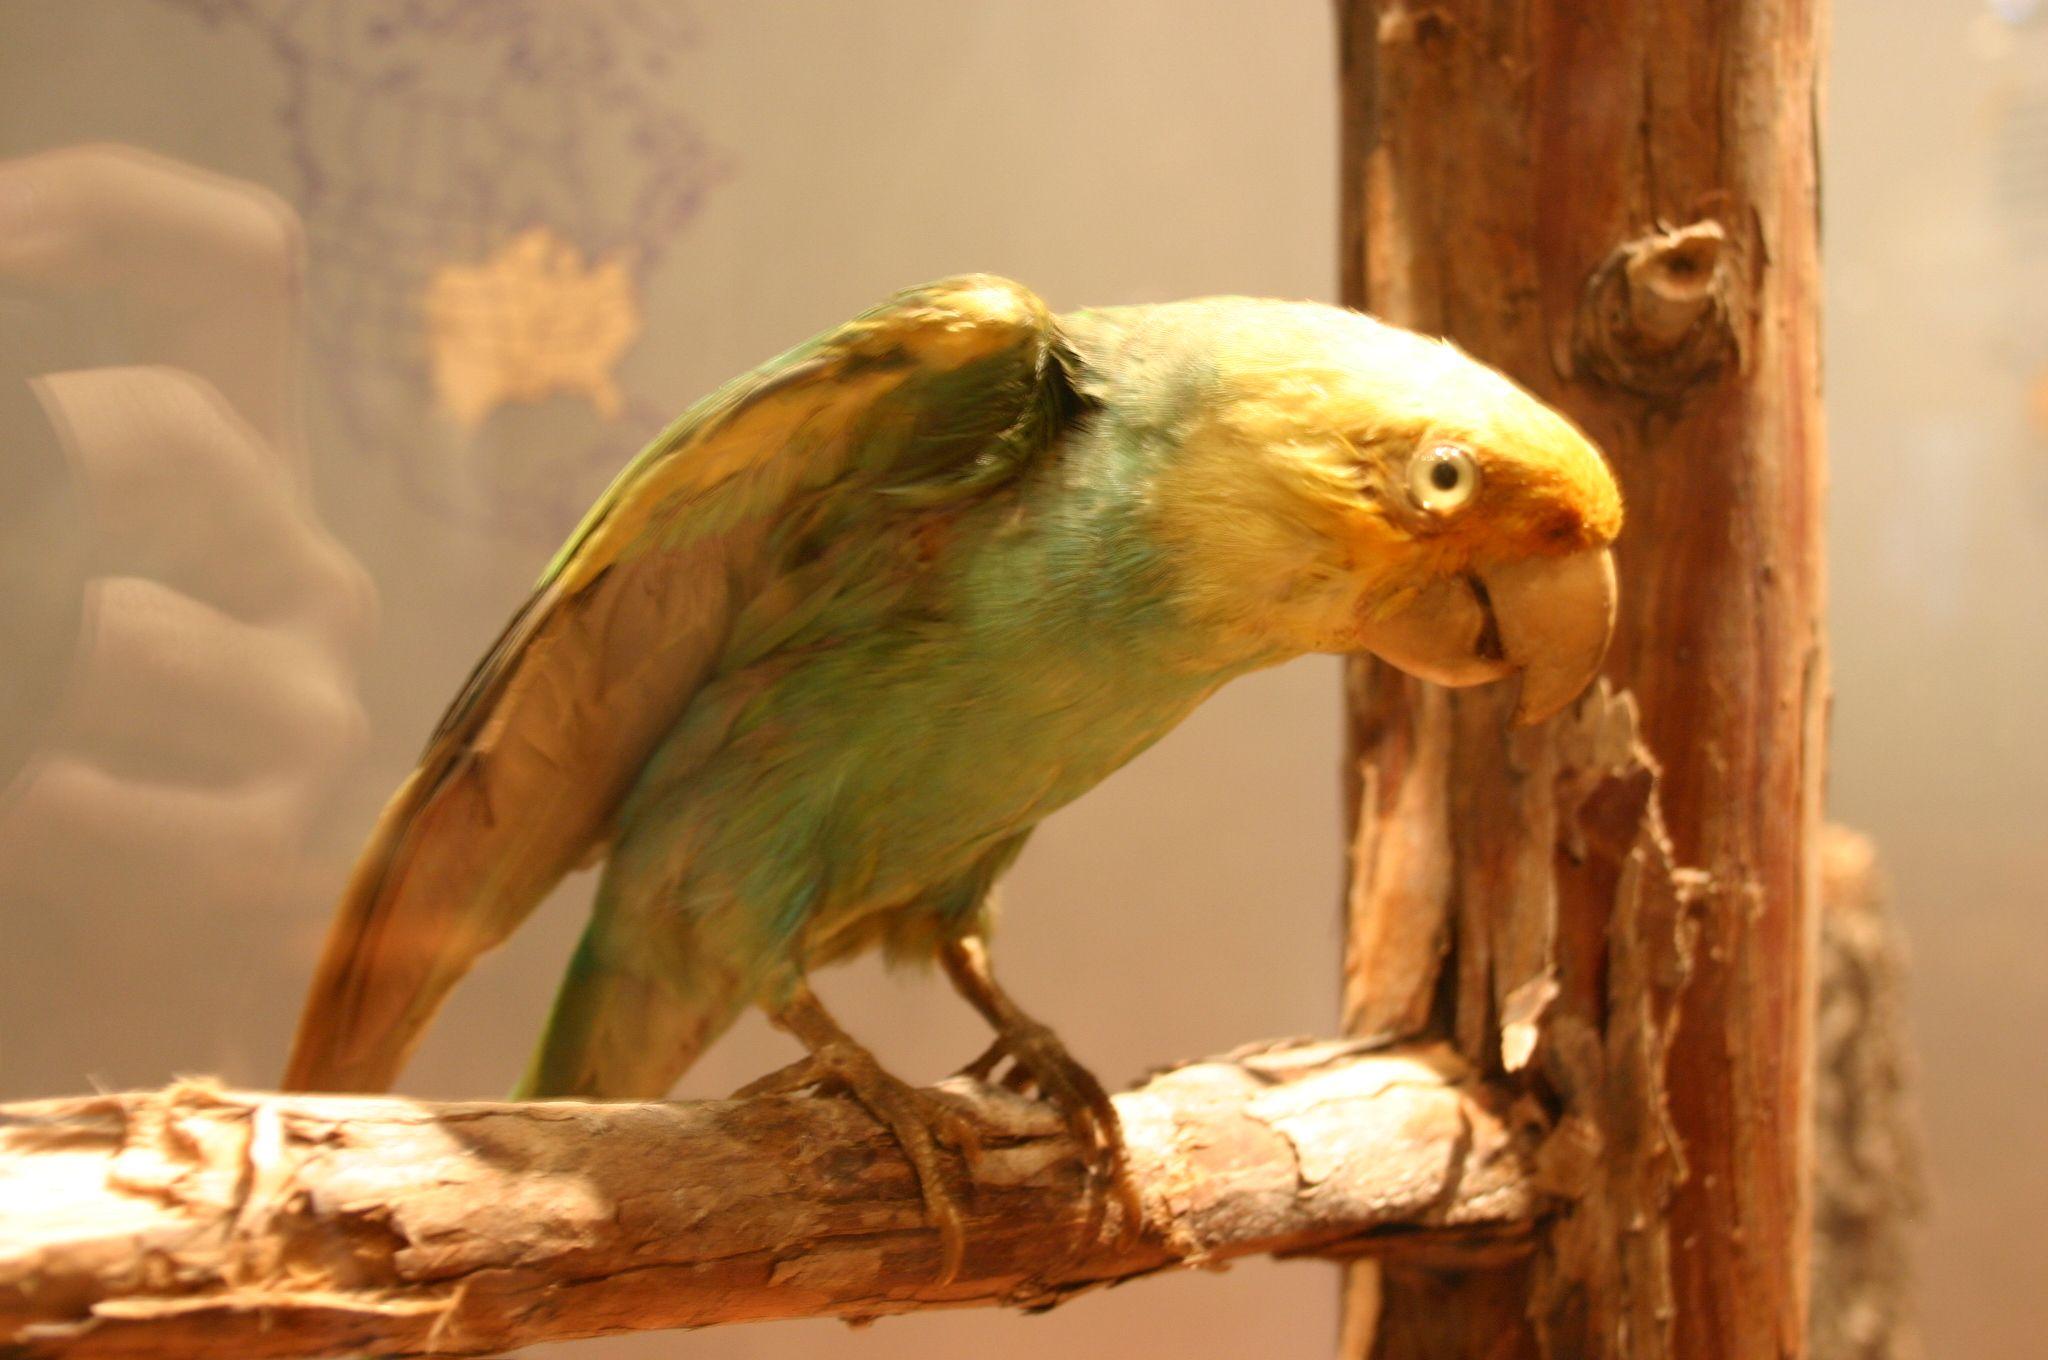 1918 The last Carolina Parakeet dies in captivity at the